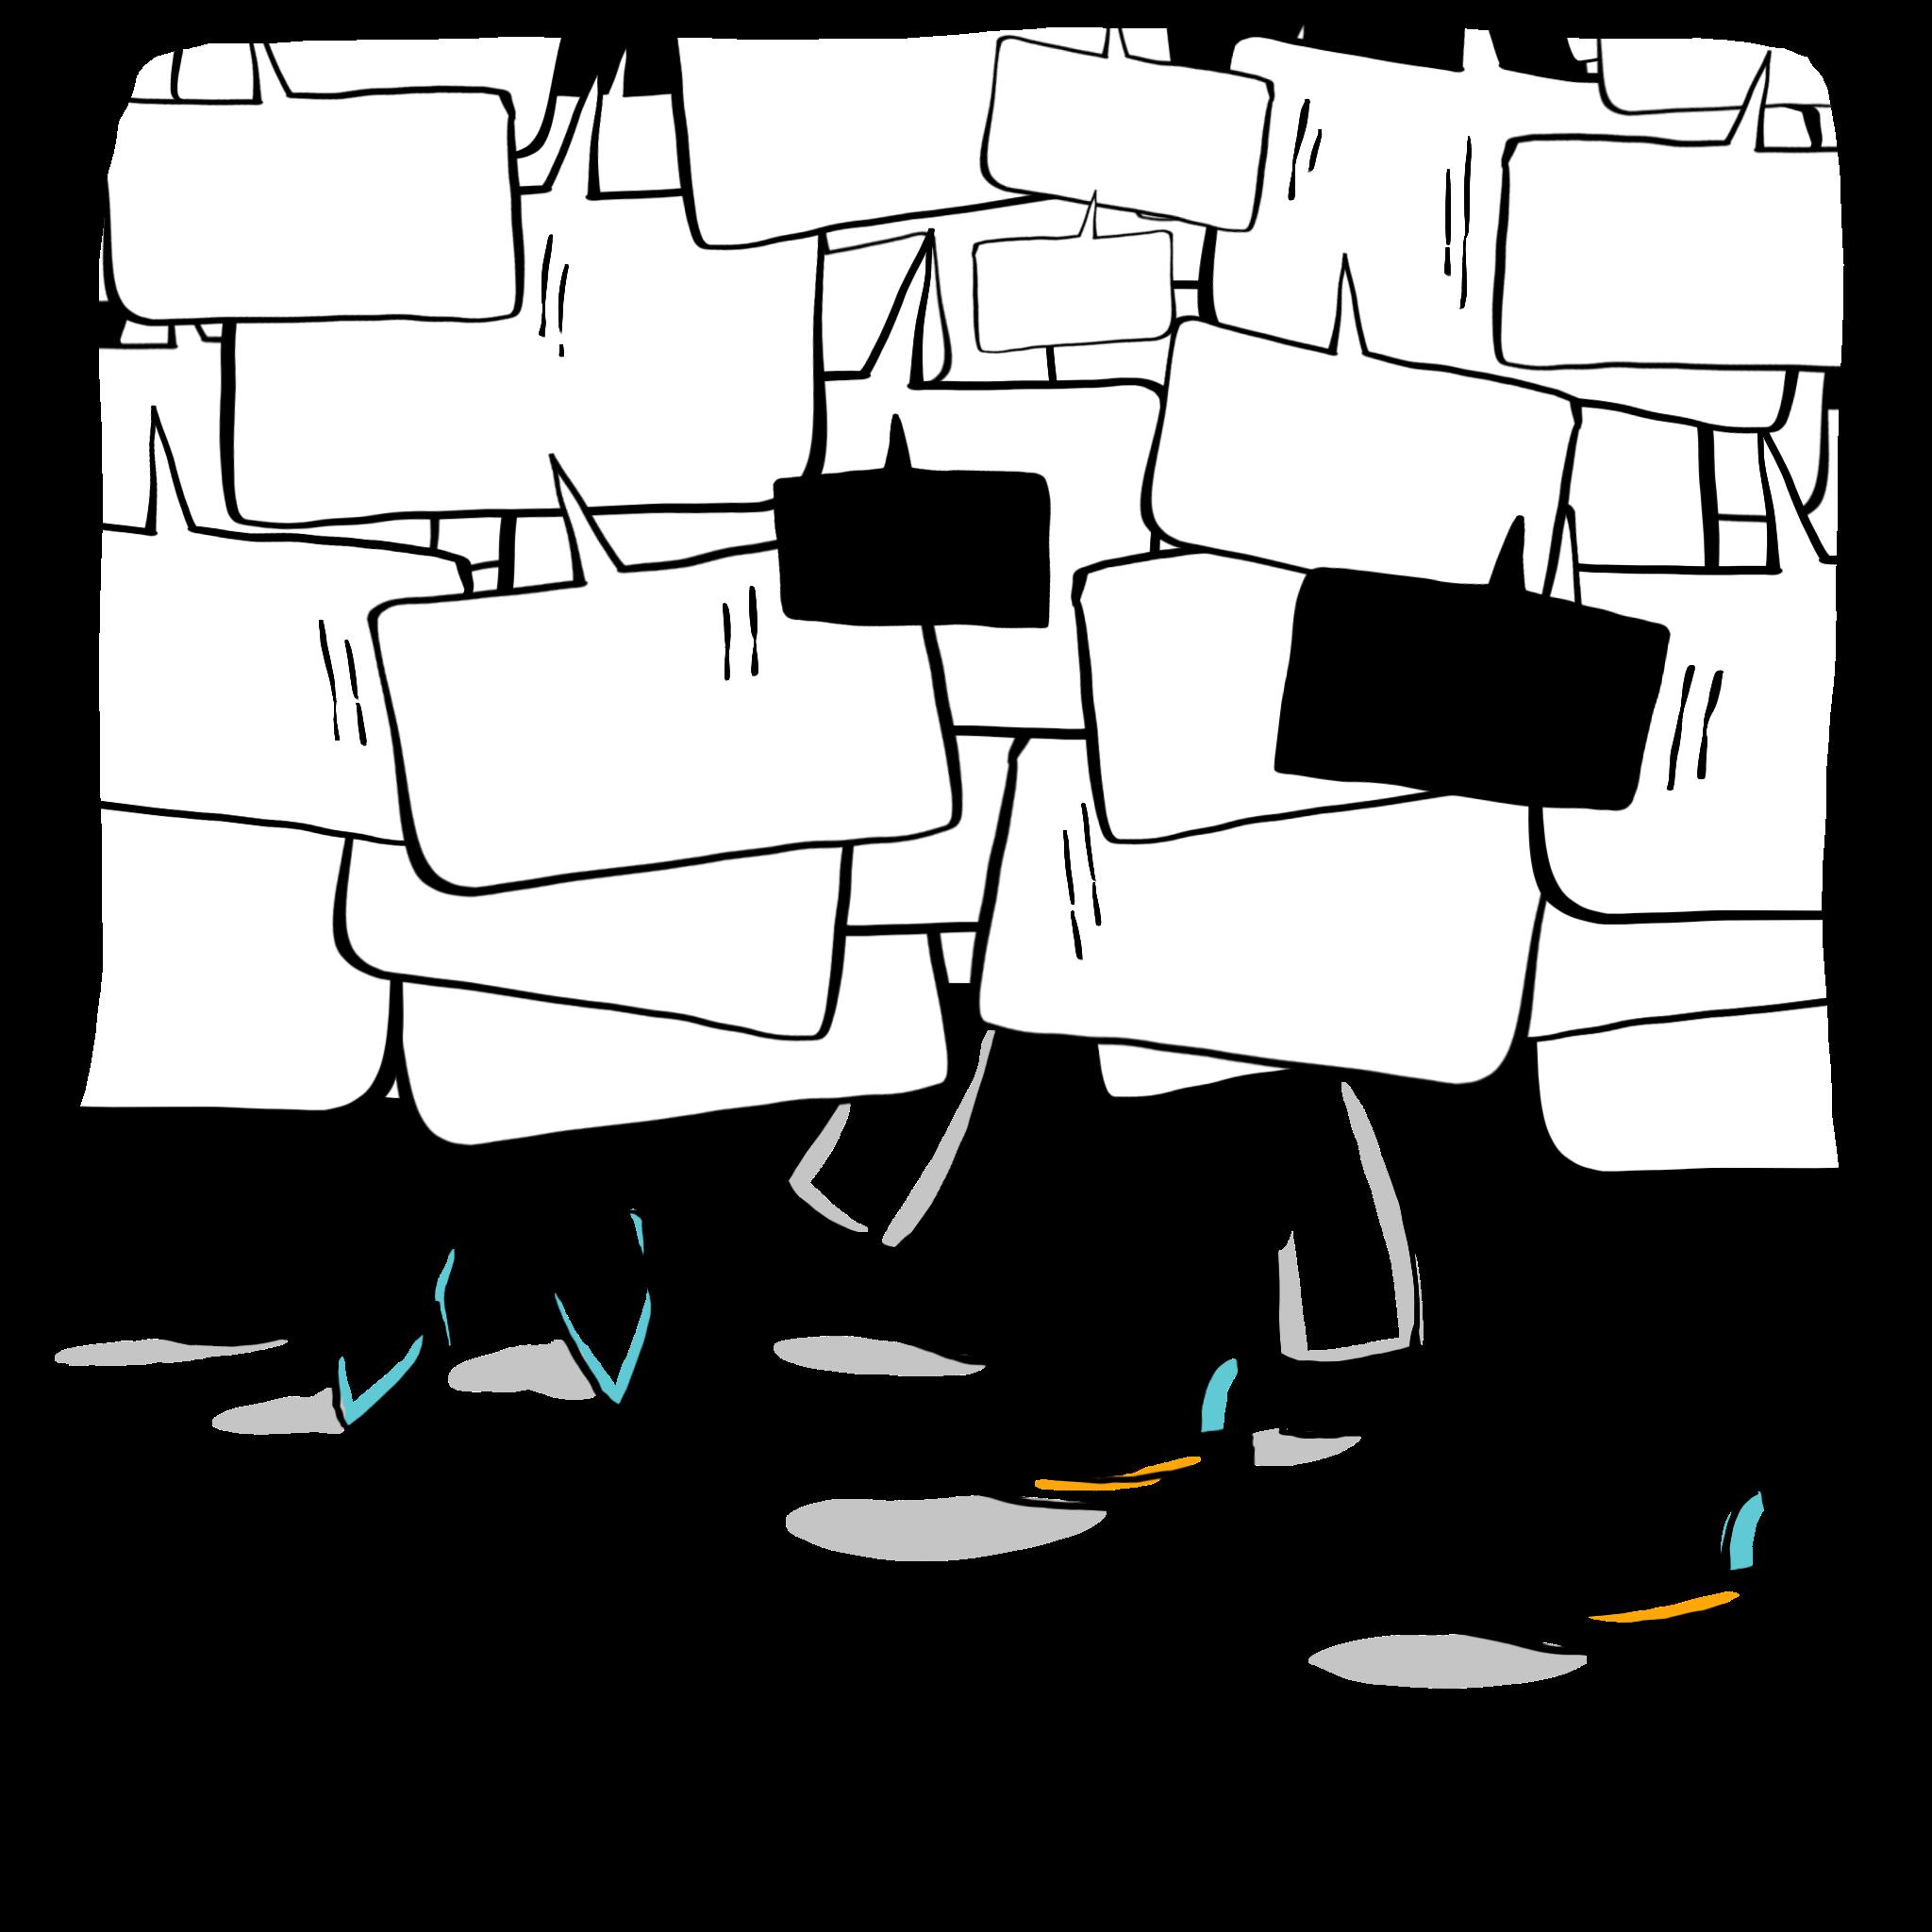 Bubblor-illustration-maja-larsson